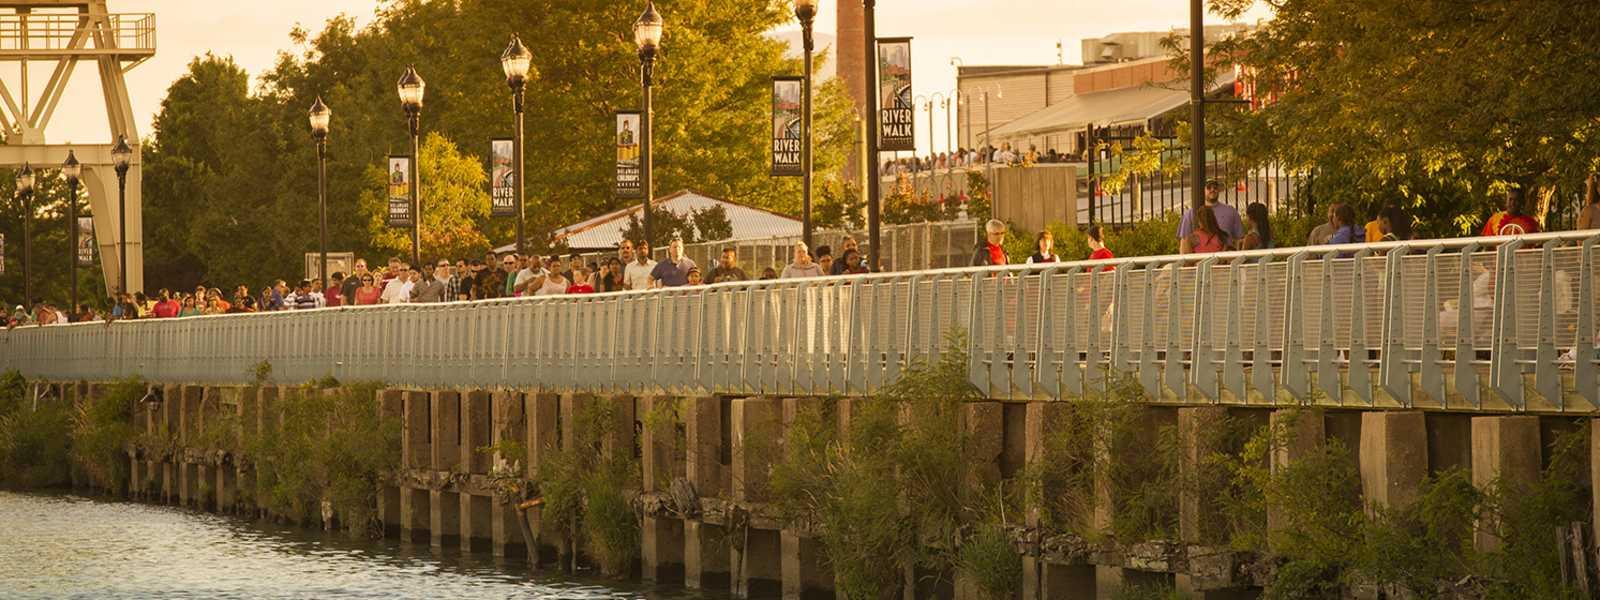 Crowded Riverwalk in Wilmington, Delaware